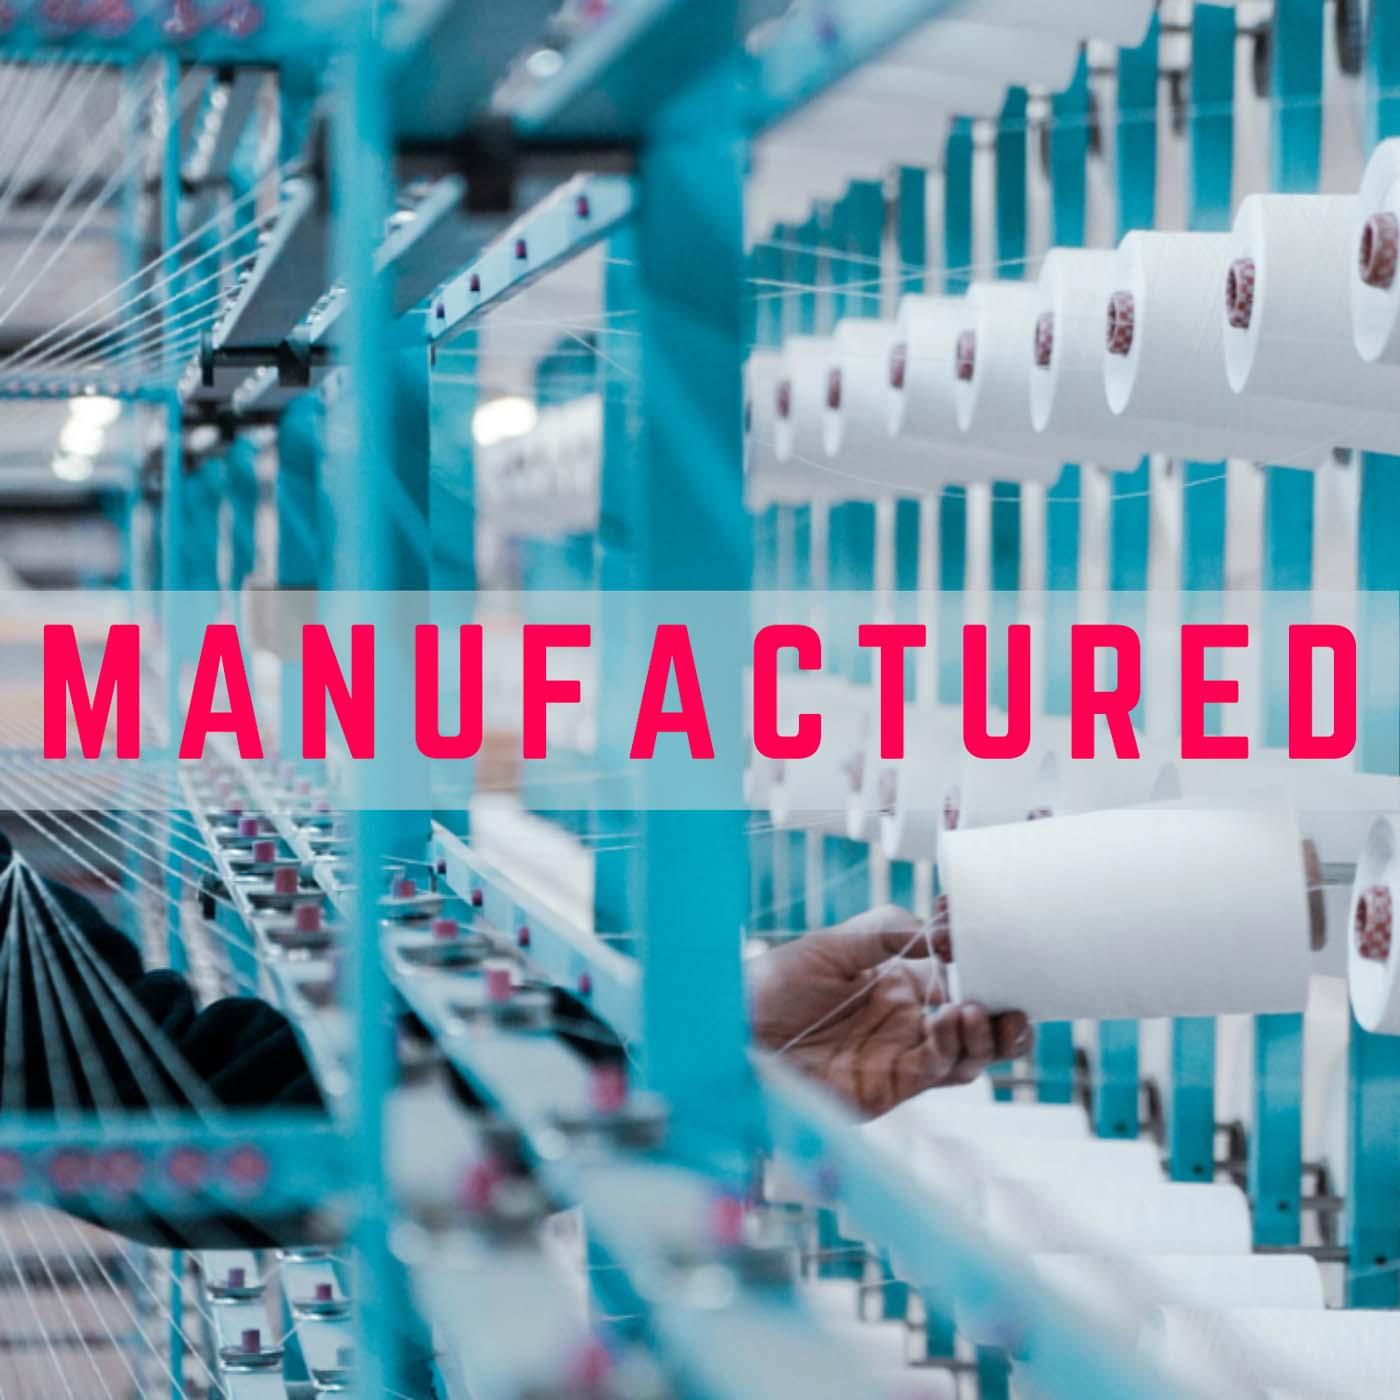 Manufactured